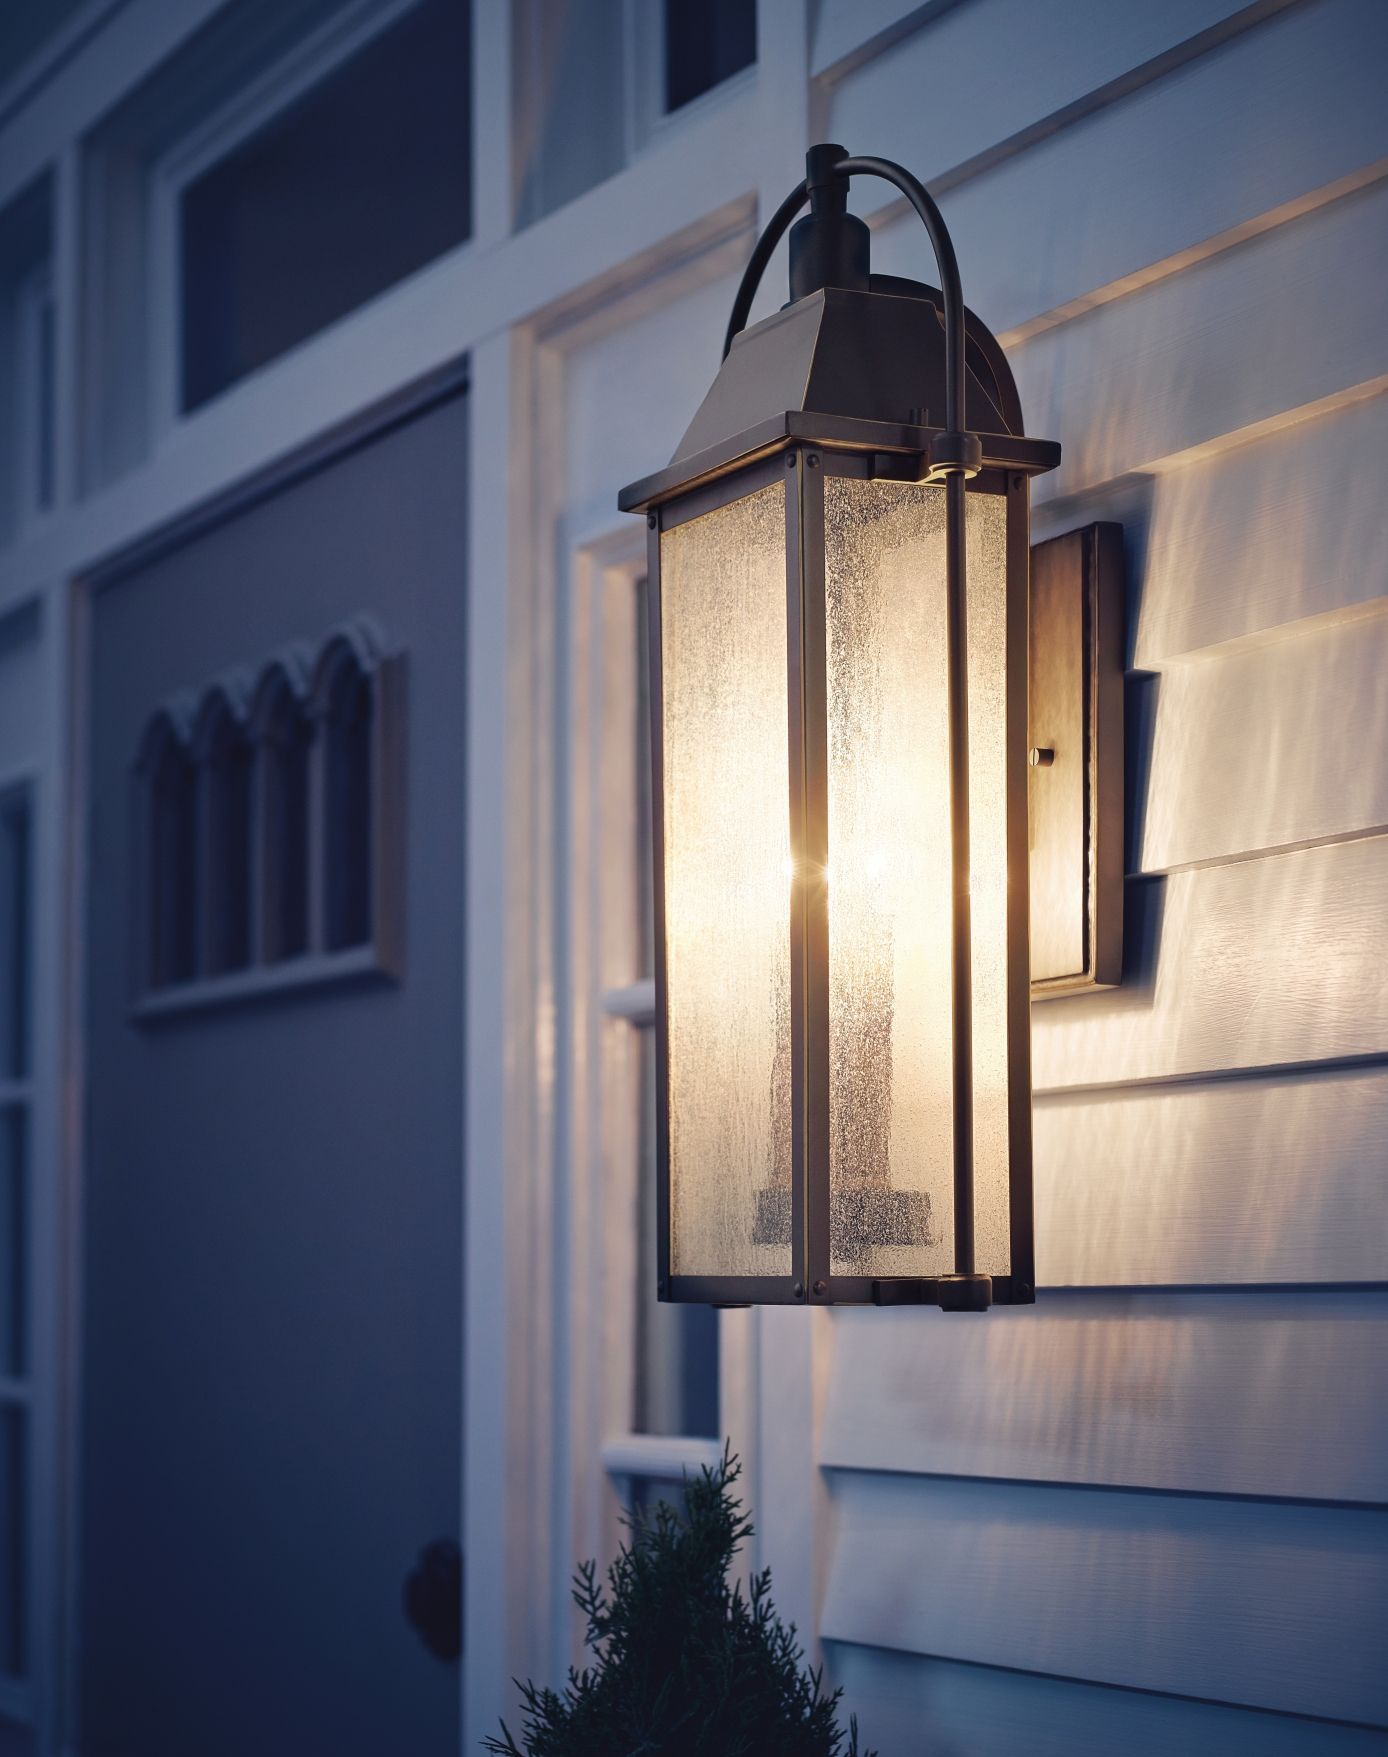 Kichler Harbor Row 23 25 Outdoor Wall Lantern In Olde Bronze Outdoor Wall Lantern Vintage Outdoor Lighting Wall Lantern